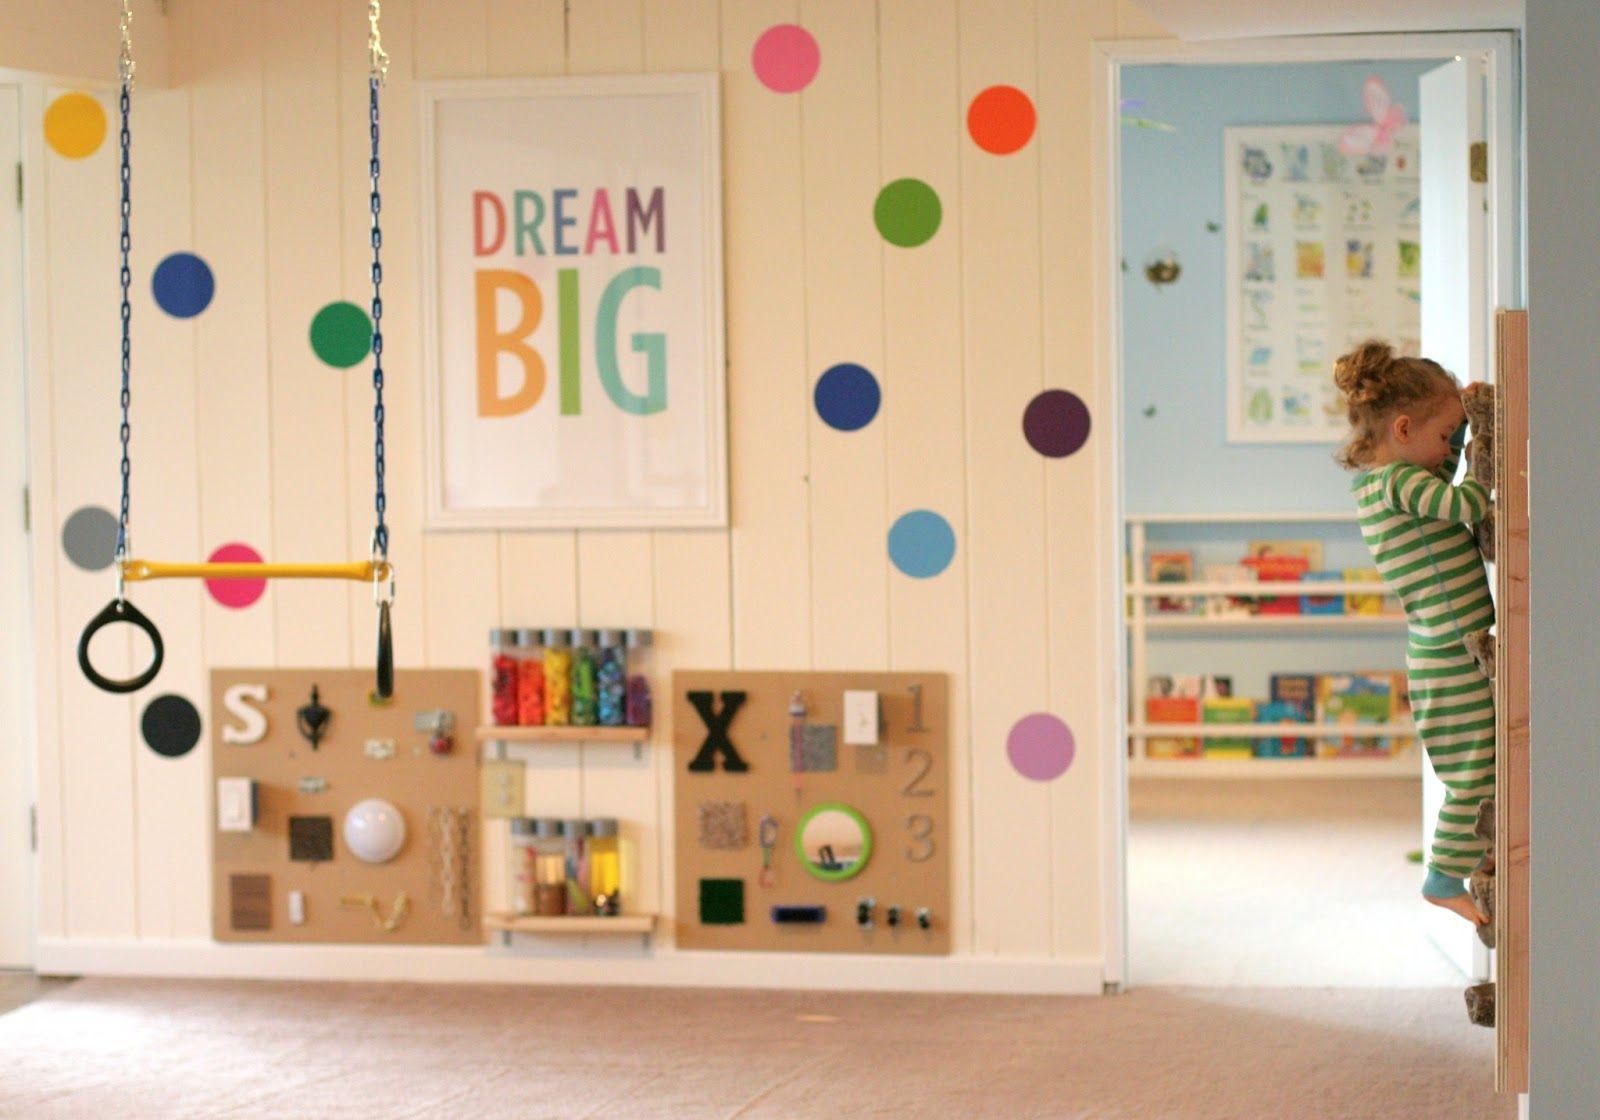 Playroom Design Diy Playroom With Rock Wall Playroom Wall Diy